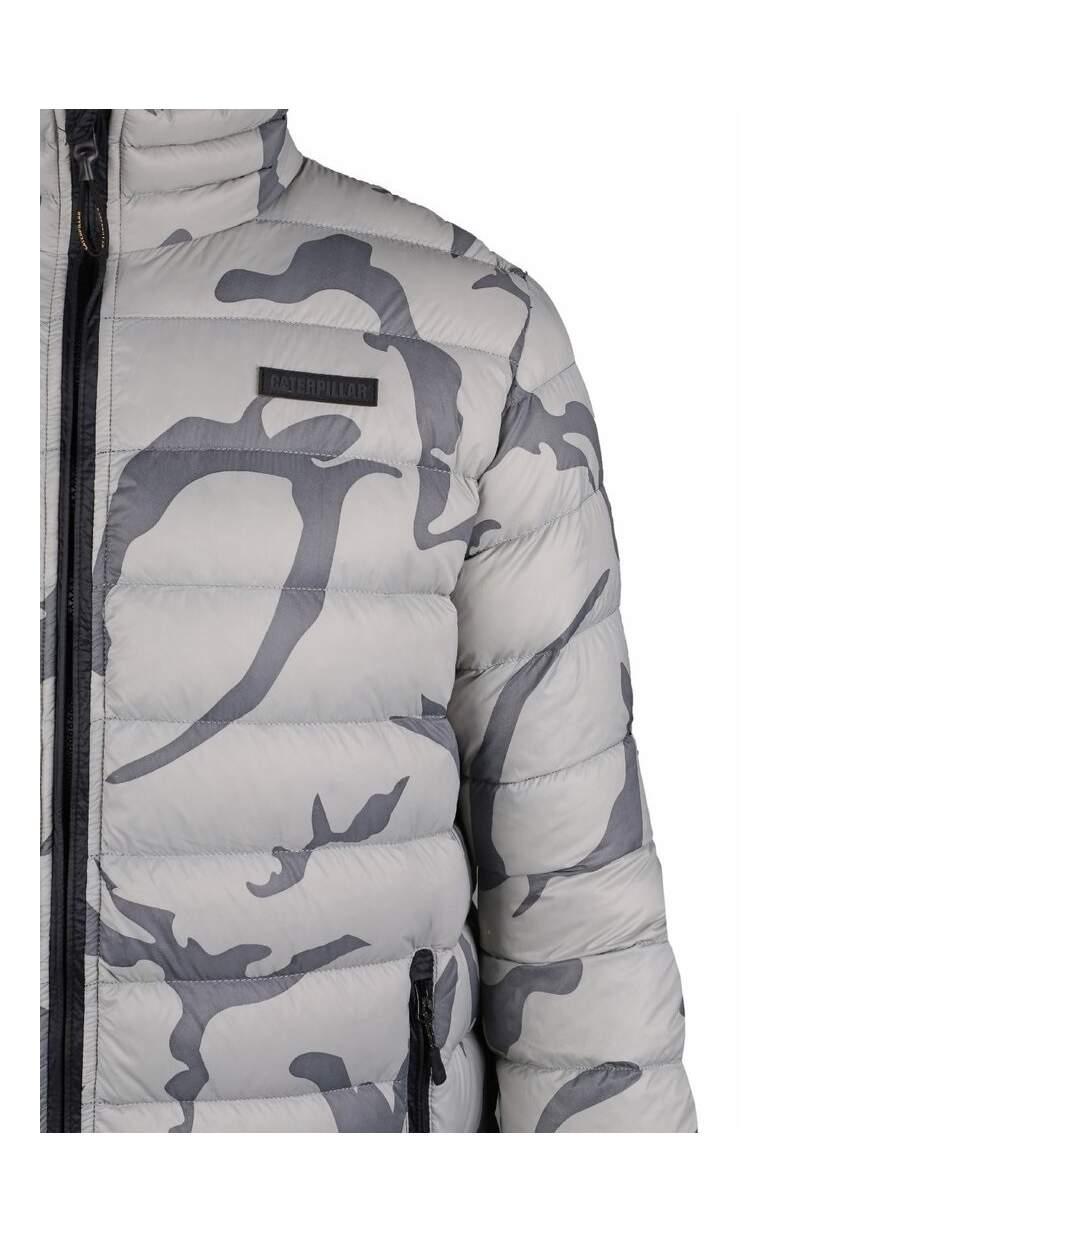 CAT Lifestyle Mens Brooklyn Down Camoflague Jacket (Camo) - UTFS4034